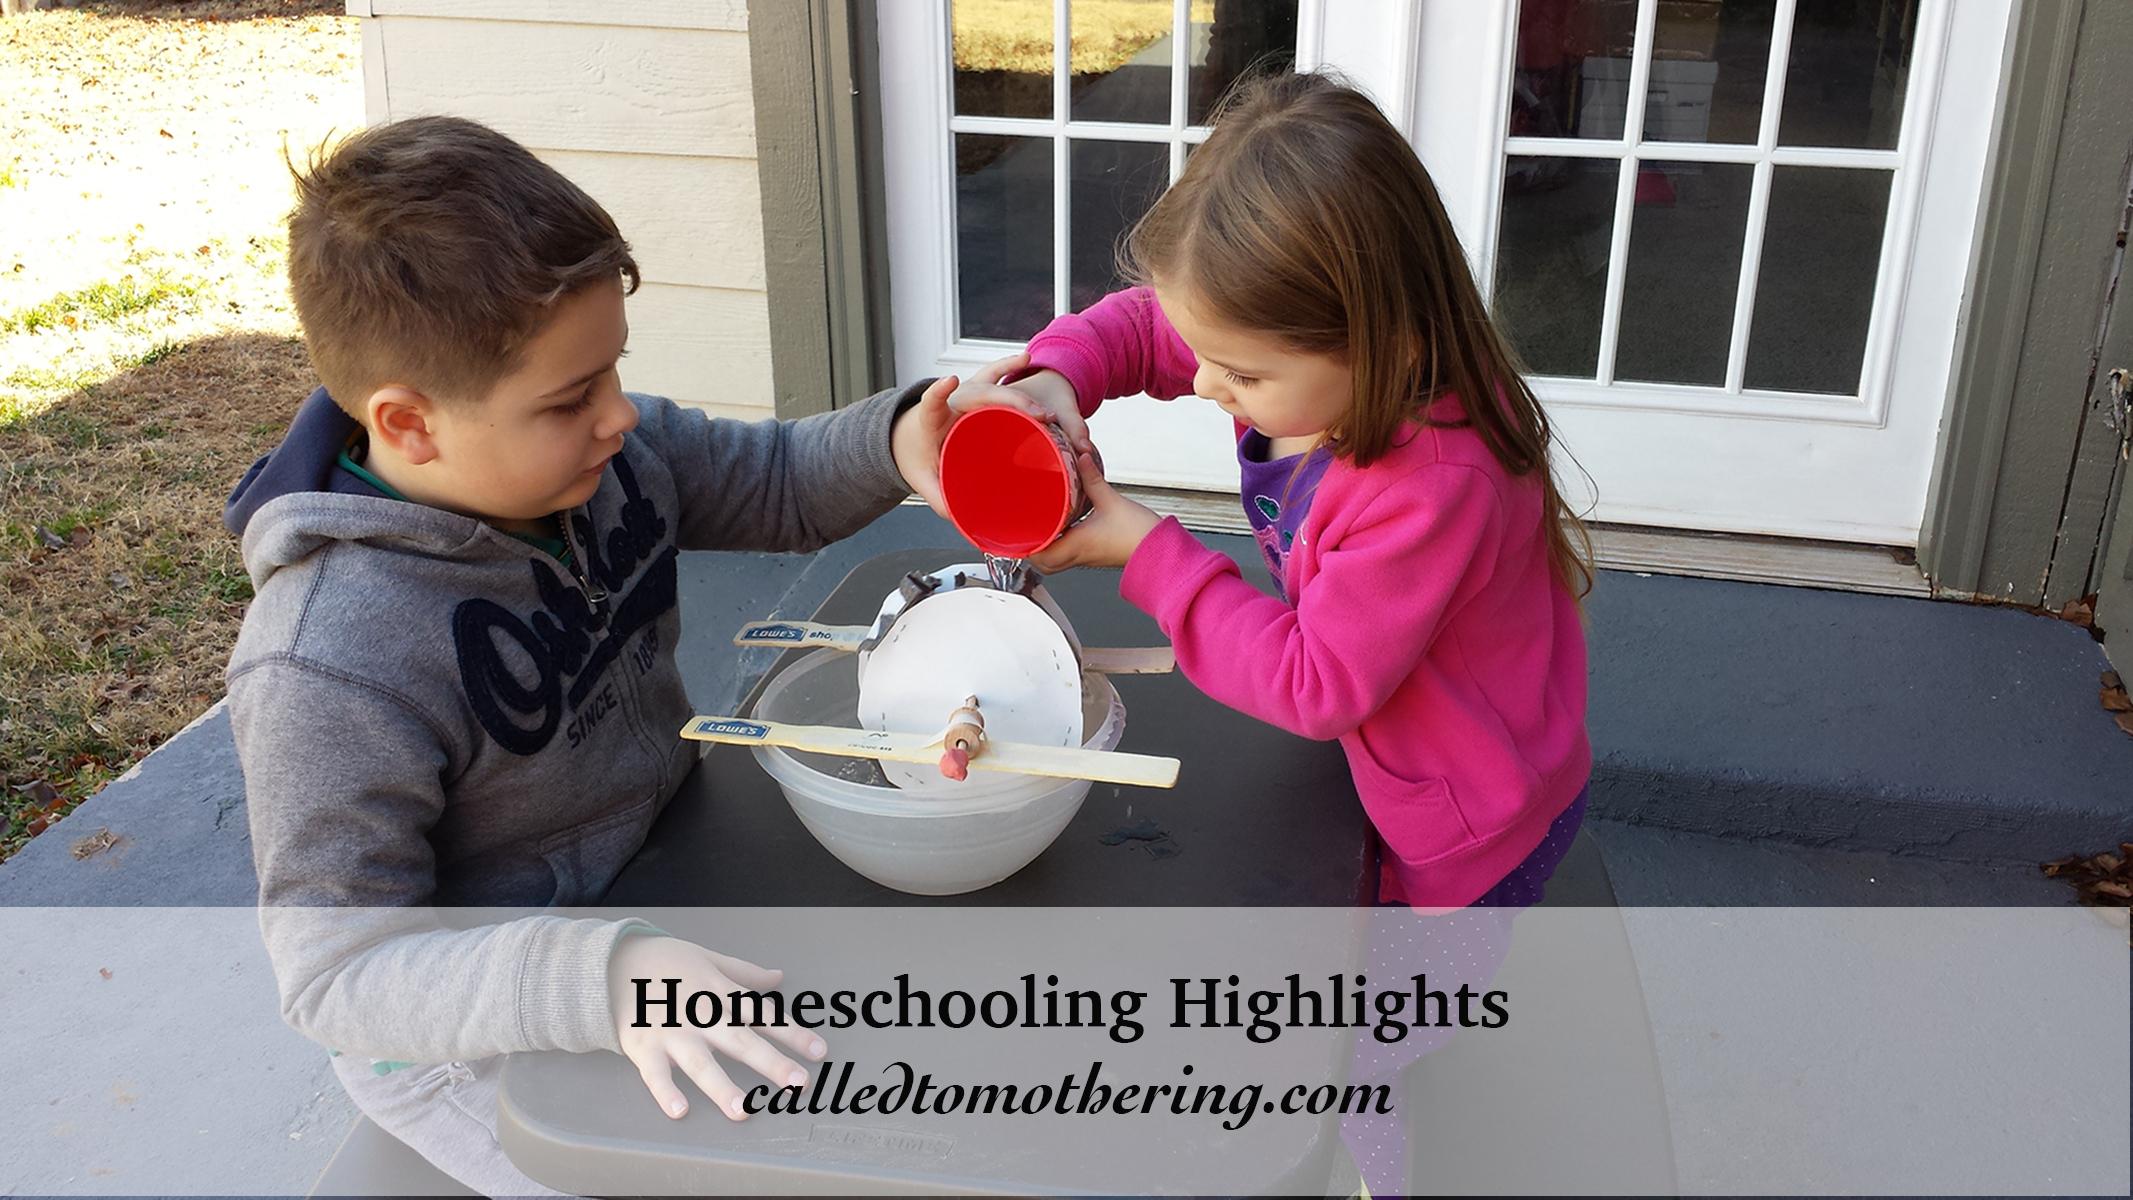 Homeschooling Highlights